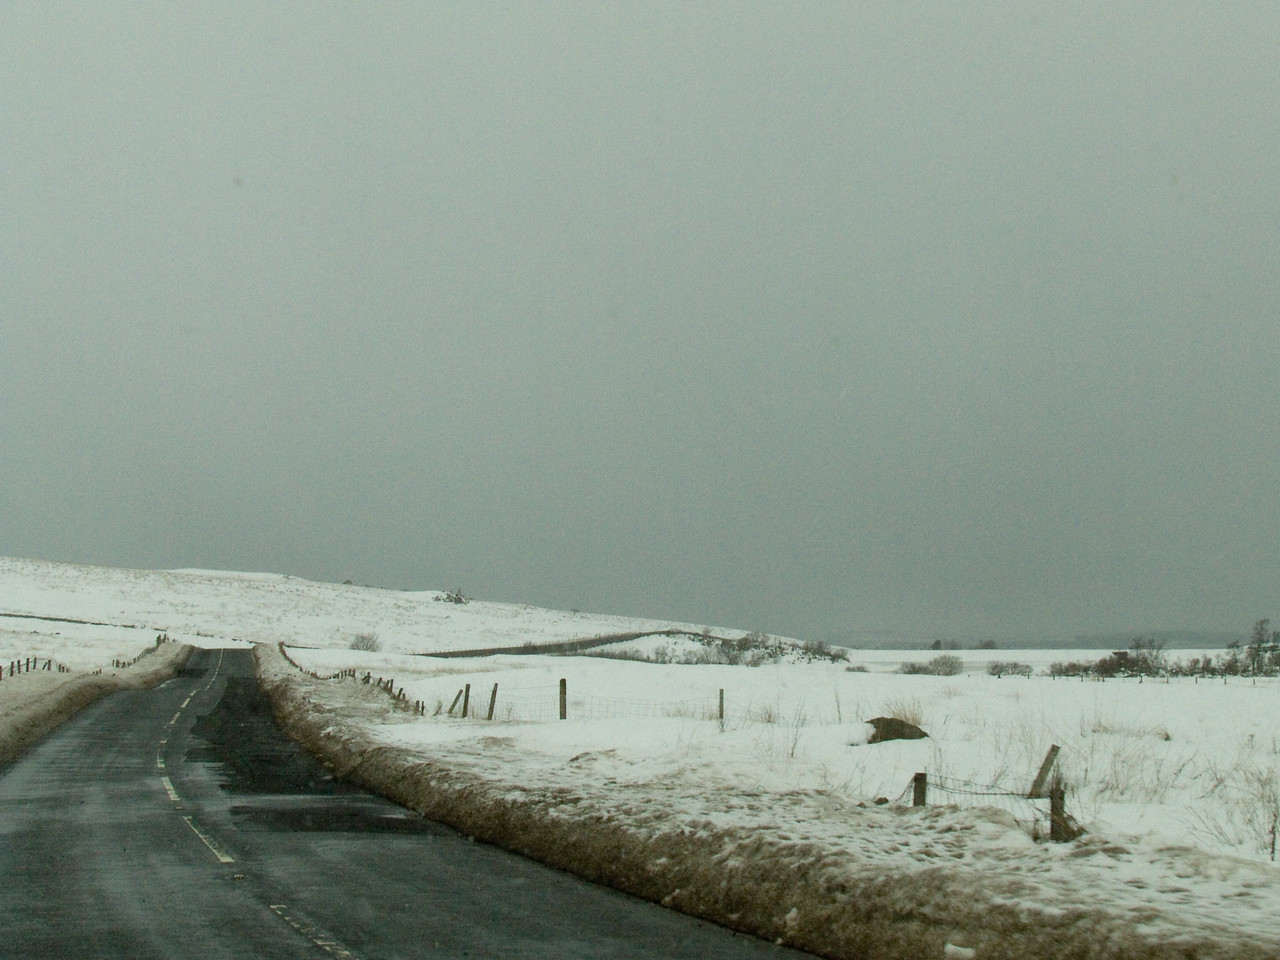 Knocknairshill Reservoir, seen from the B788